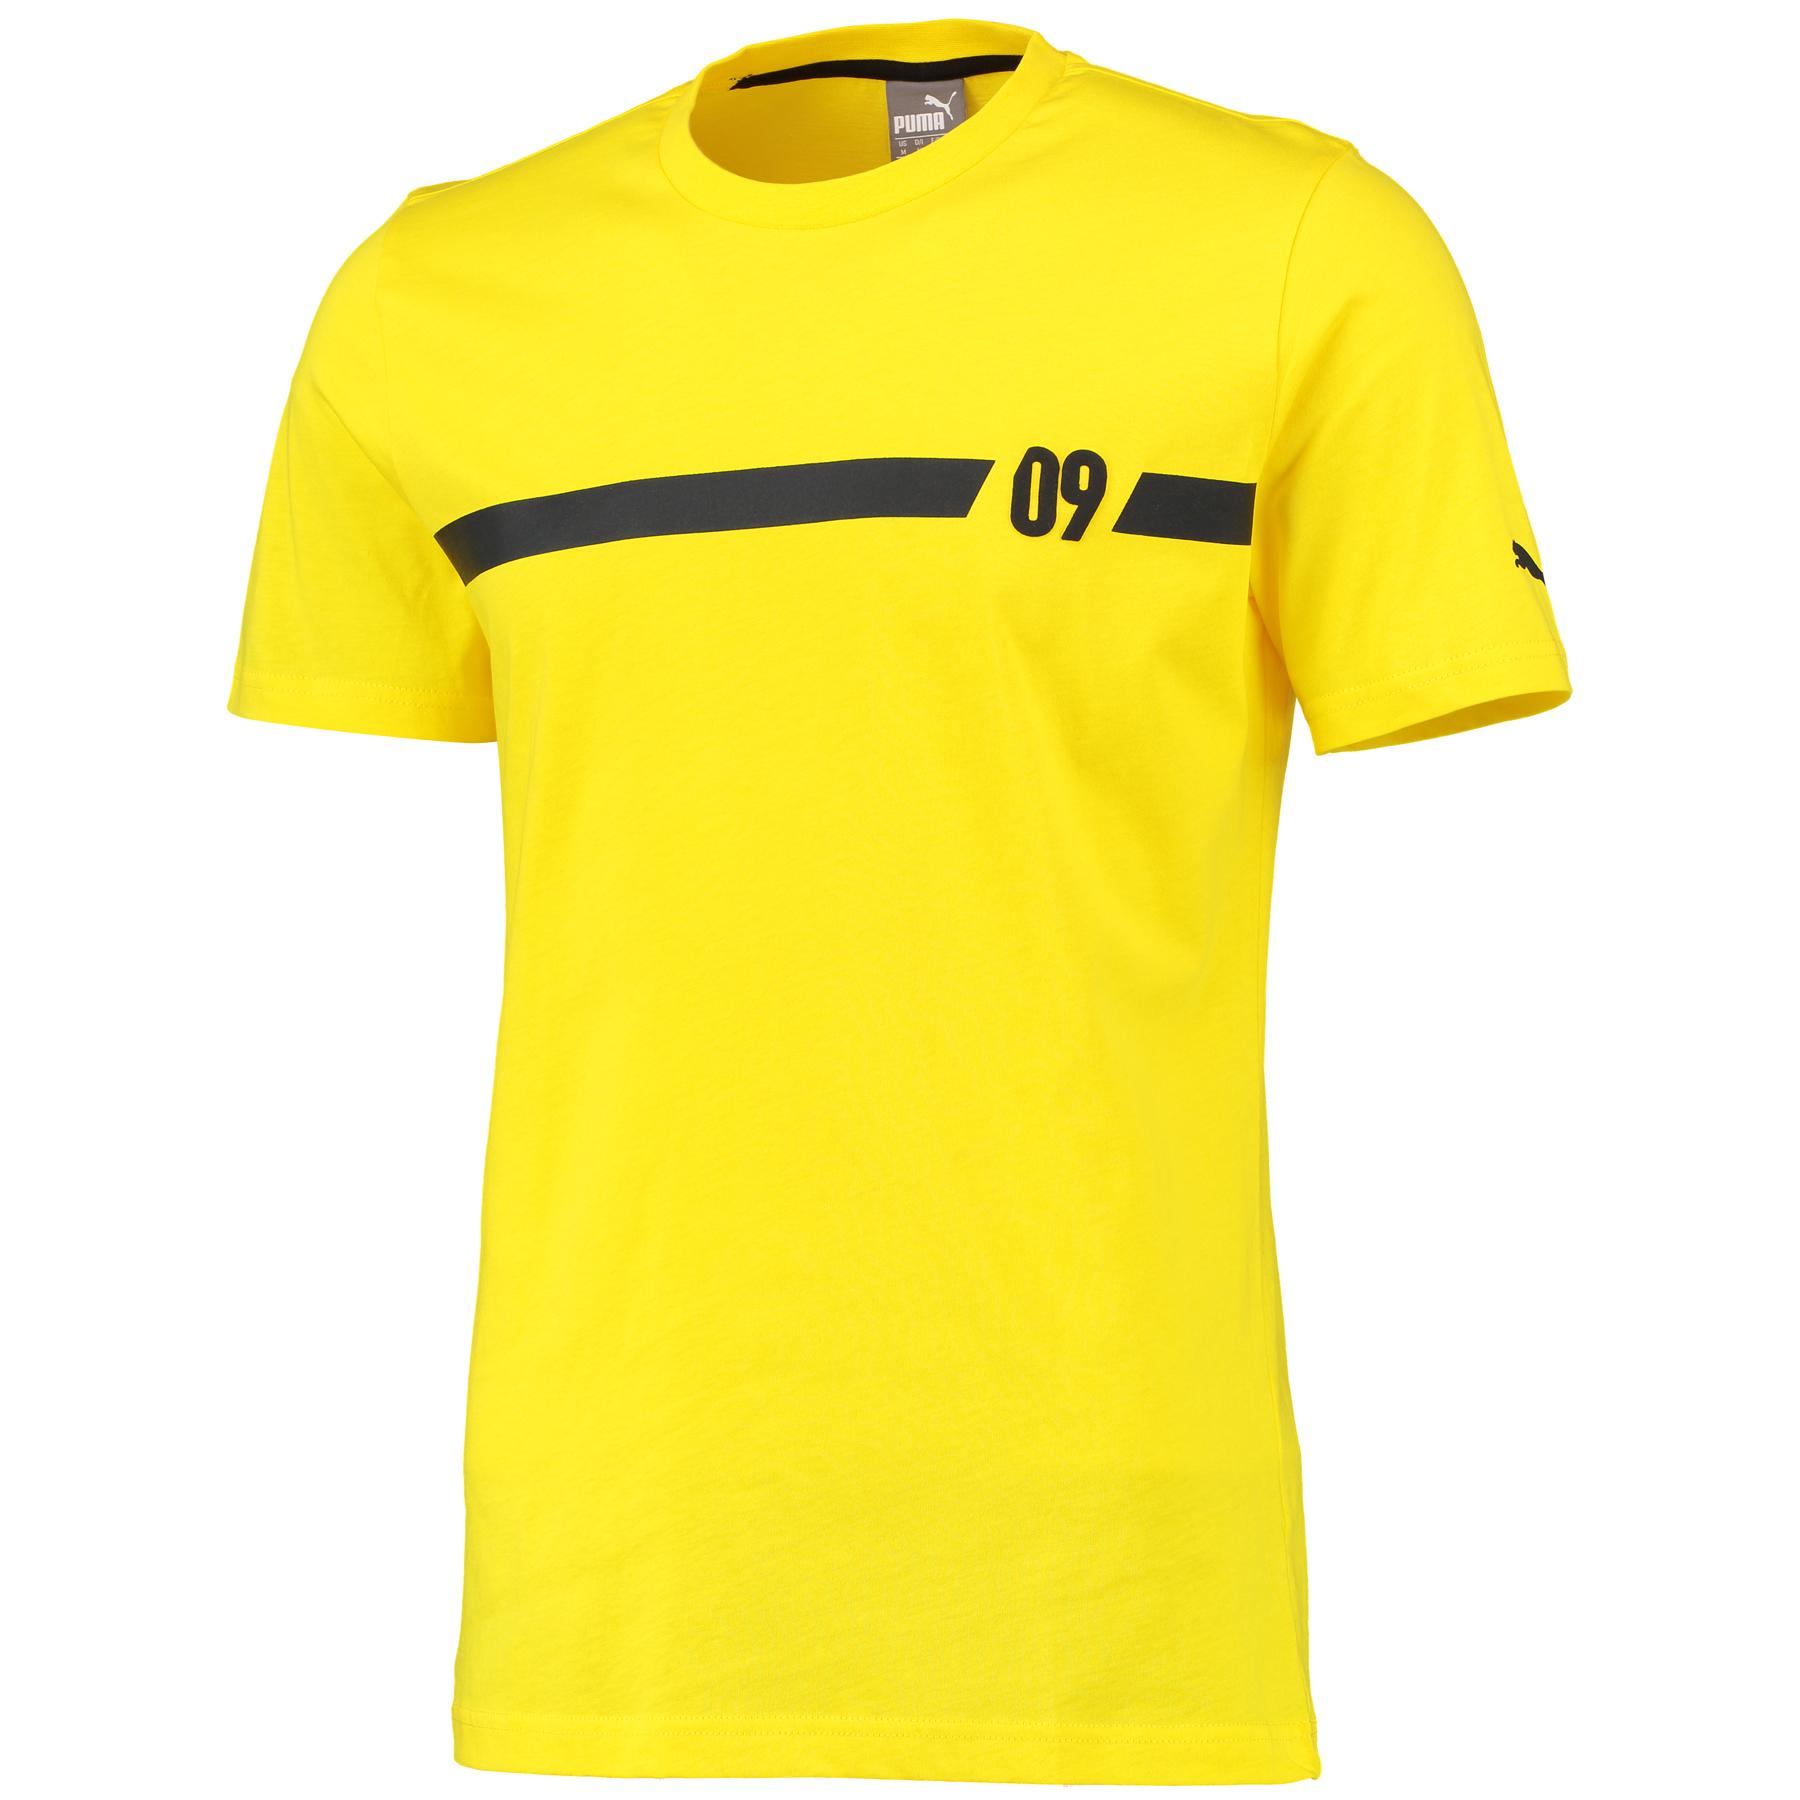 BVB 09 T-Shirt Yellow